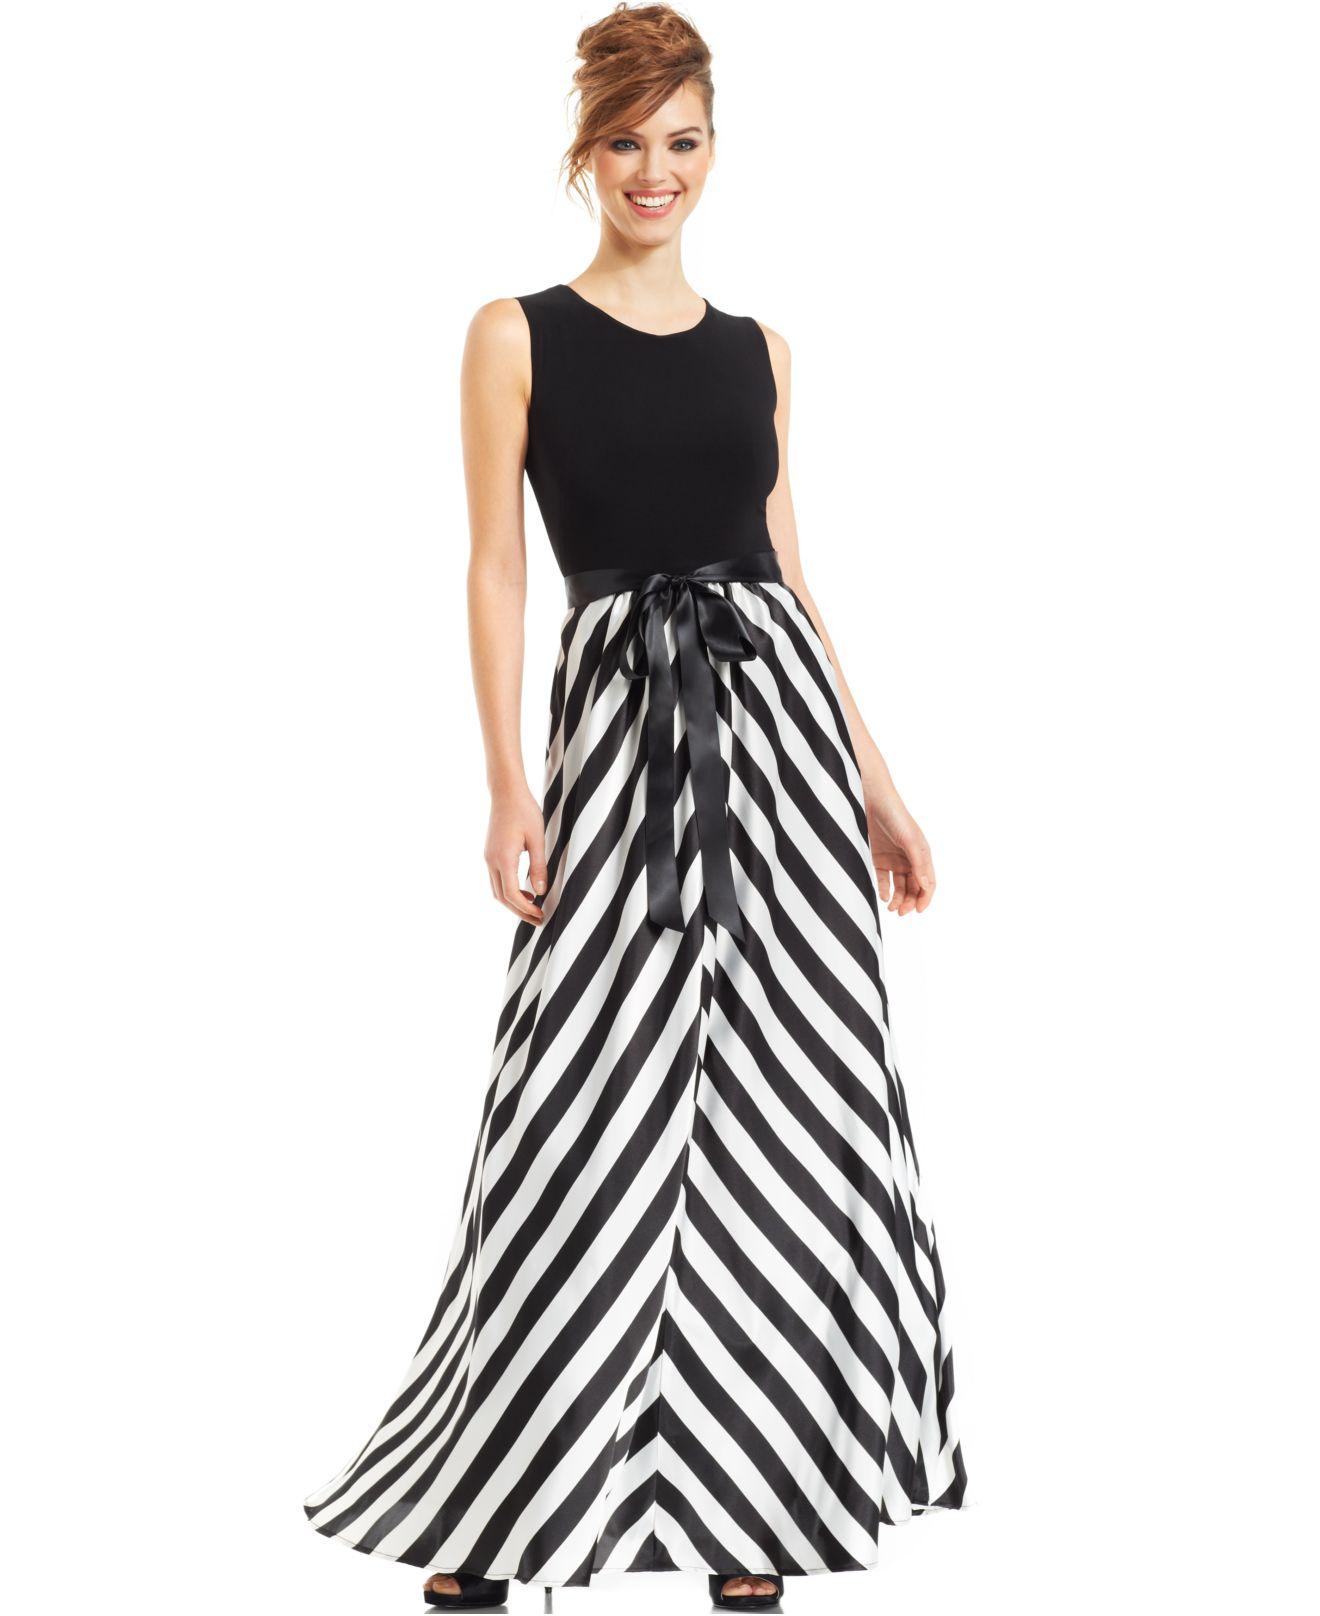 Betsy & adam Chevron-striped Gown in Black | Lyst